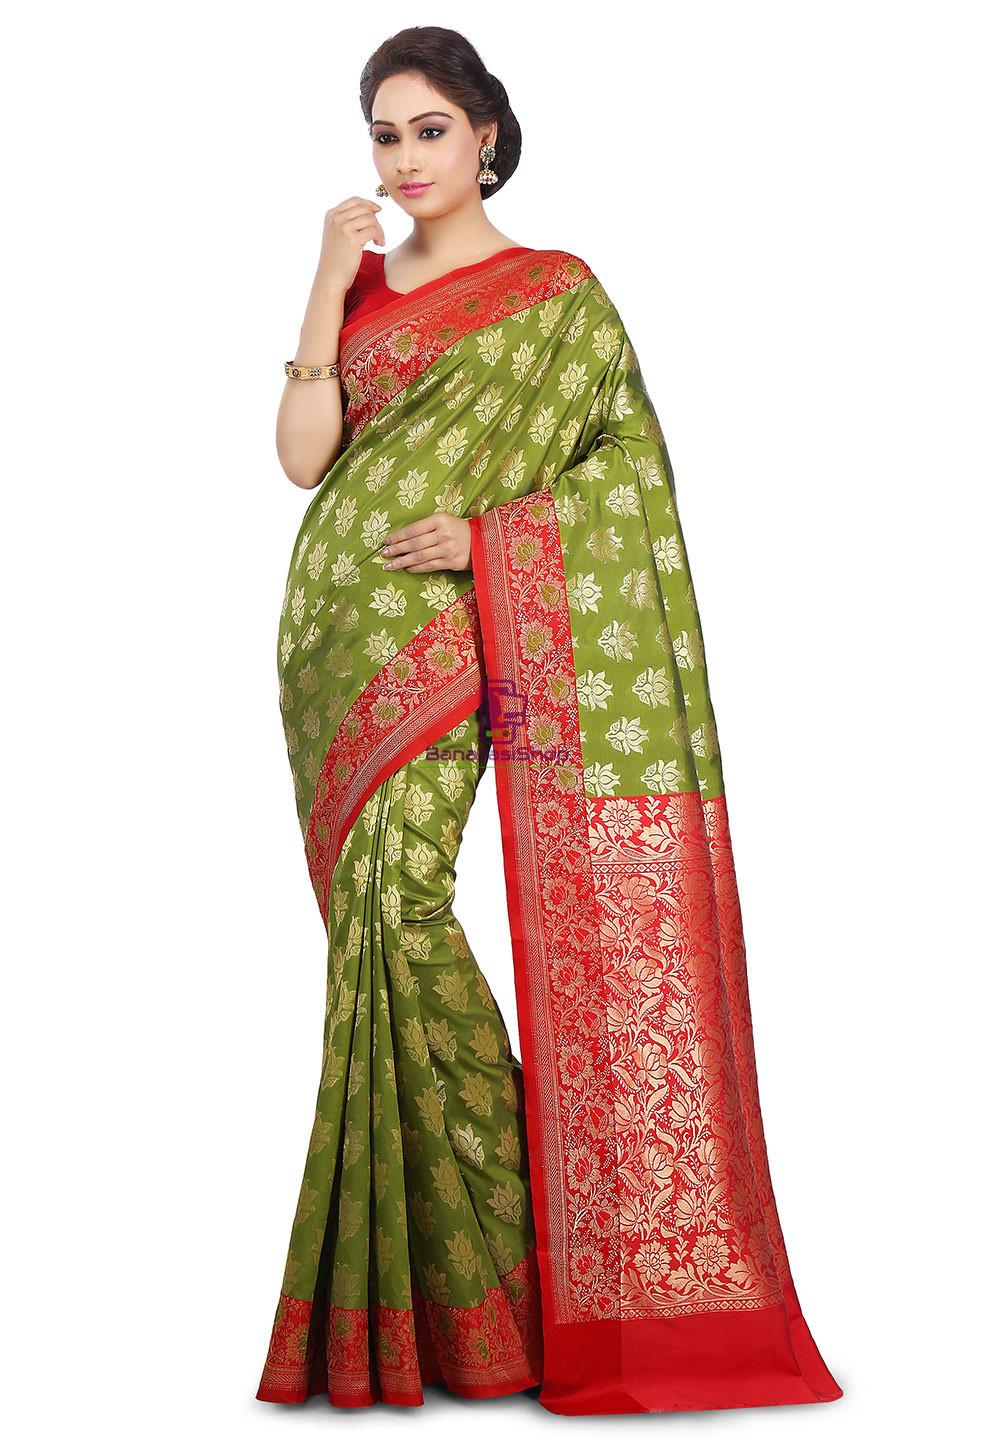 Woven Banarasi Art Silk Saree in Olive Green and Red 1